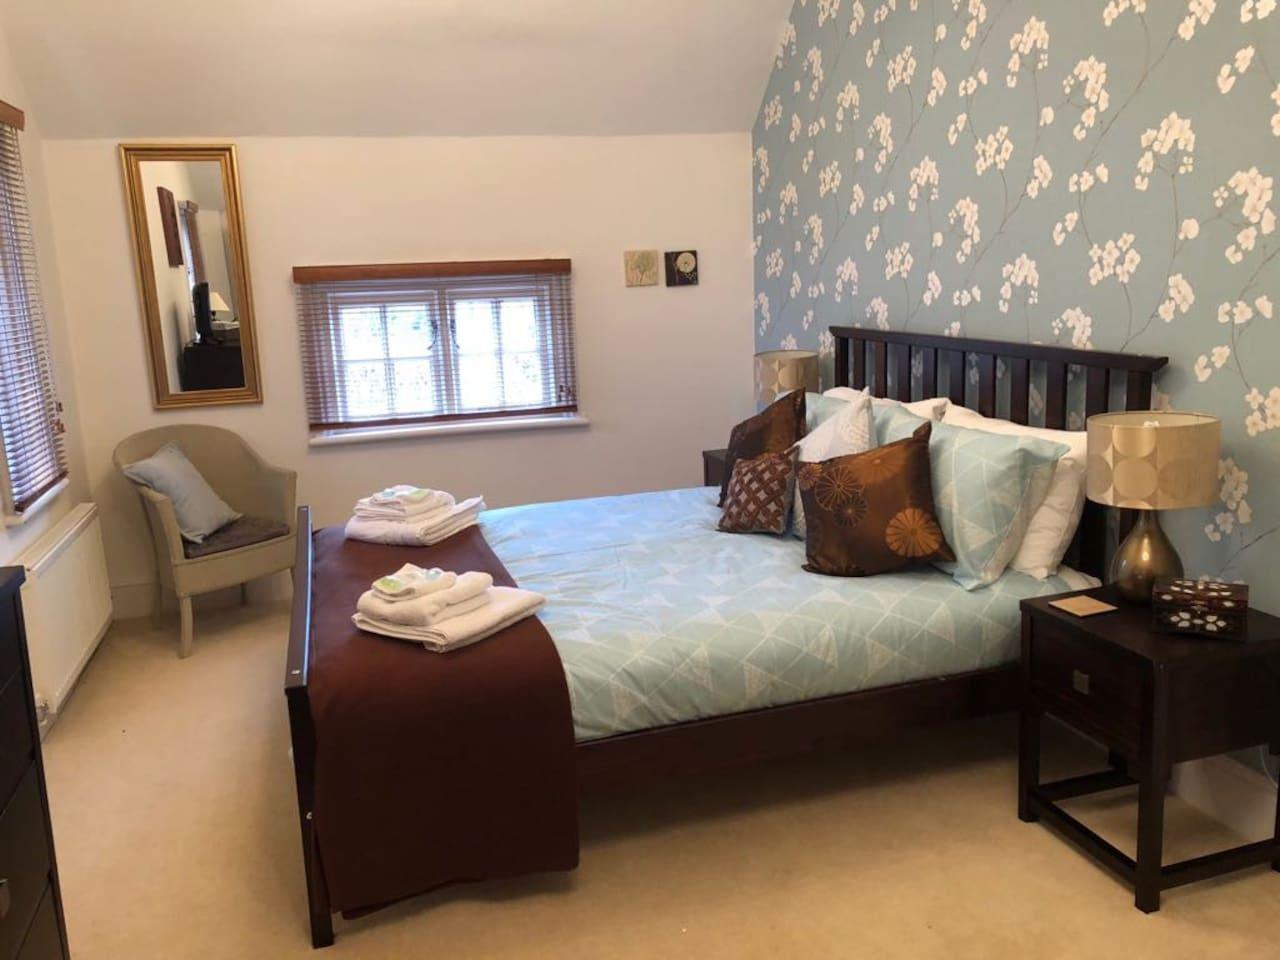 Double Room with En-Suite in rural setting